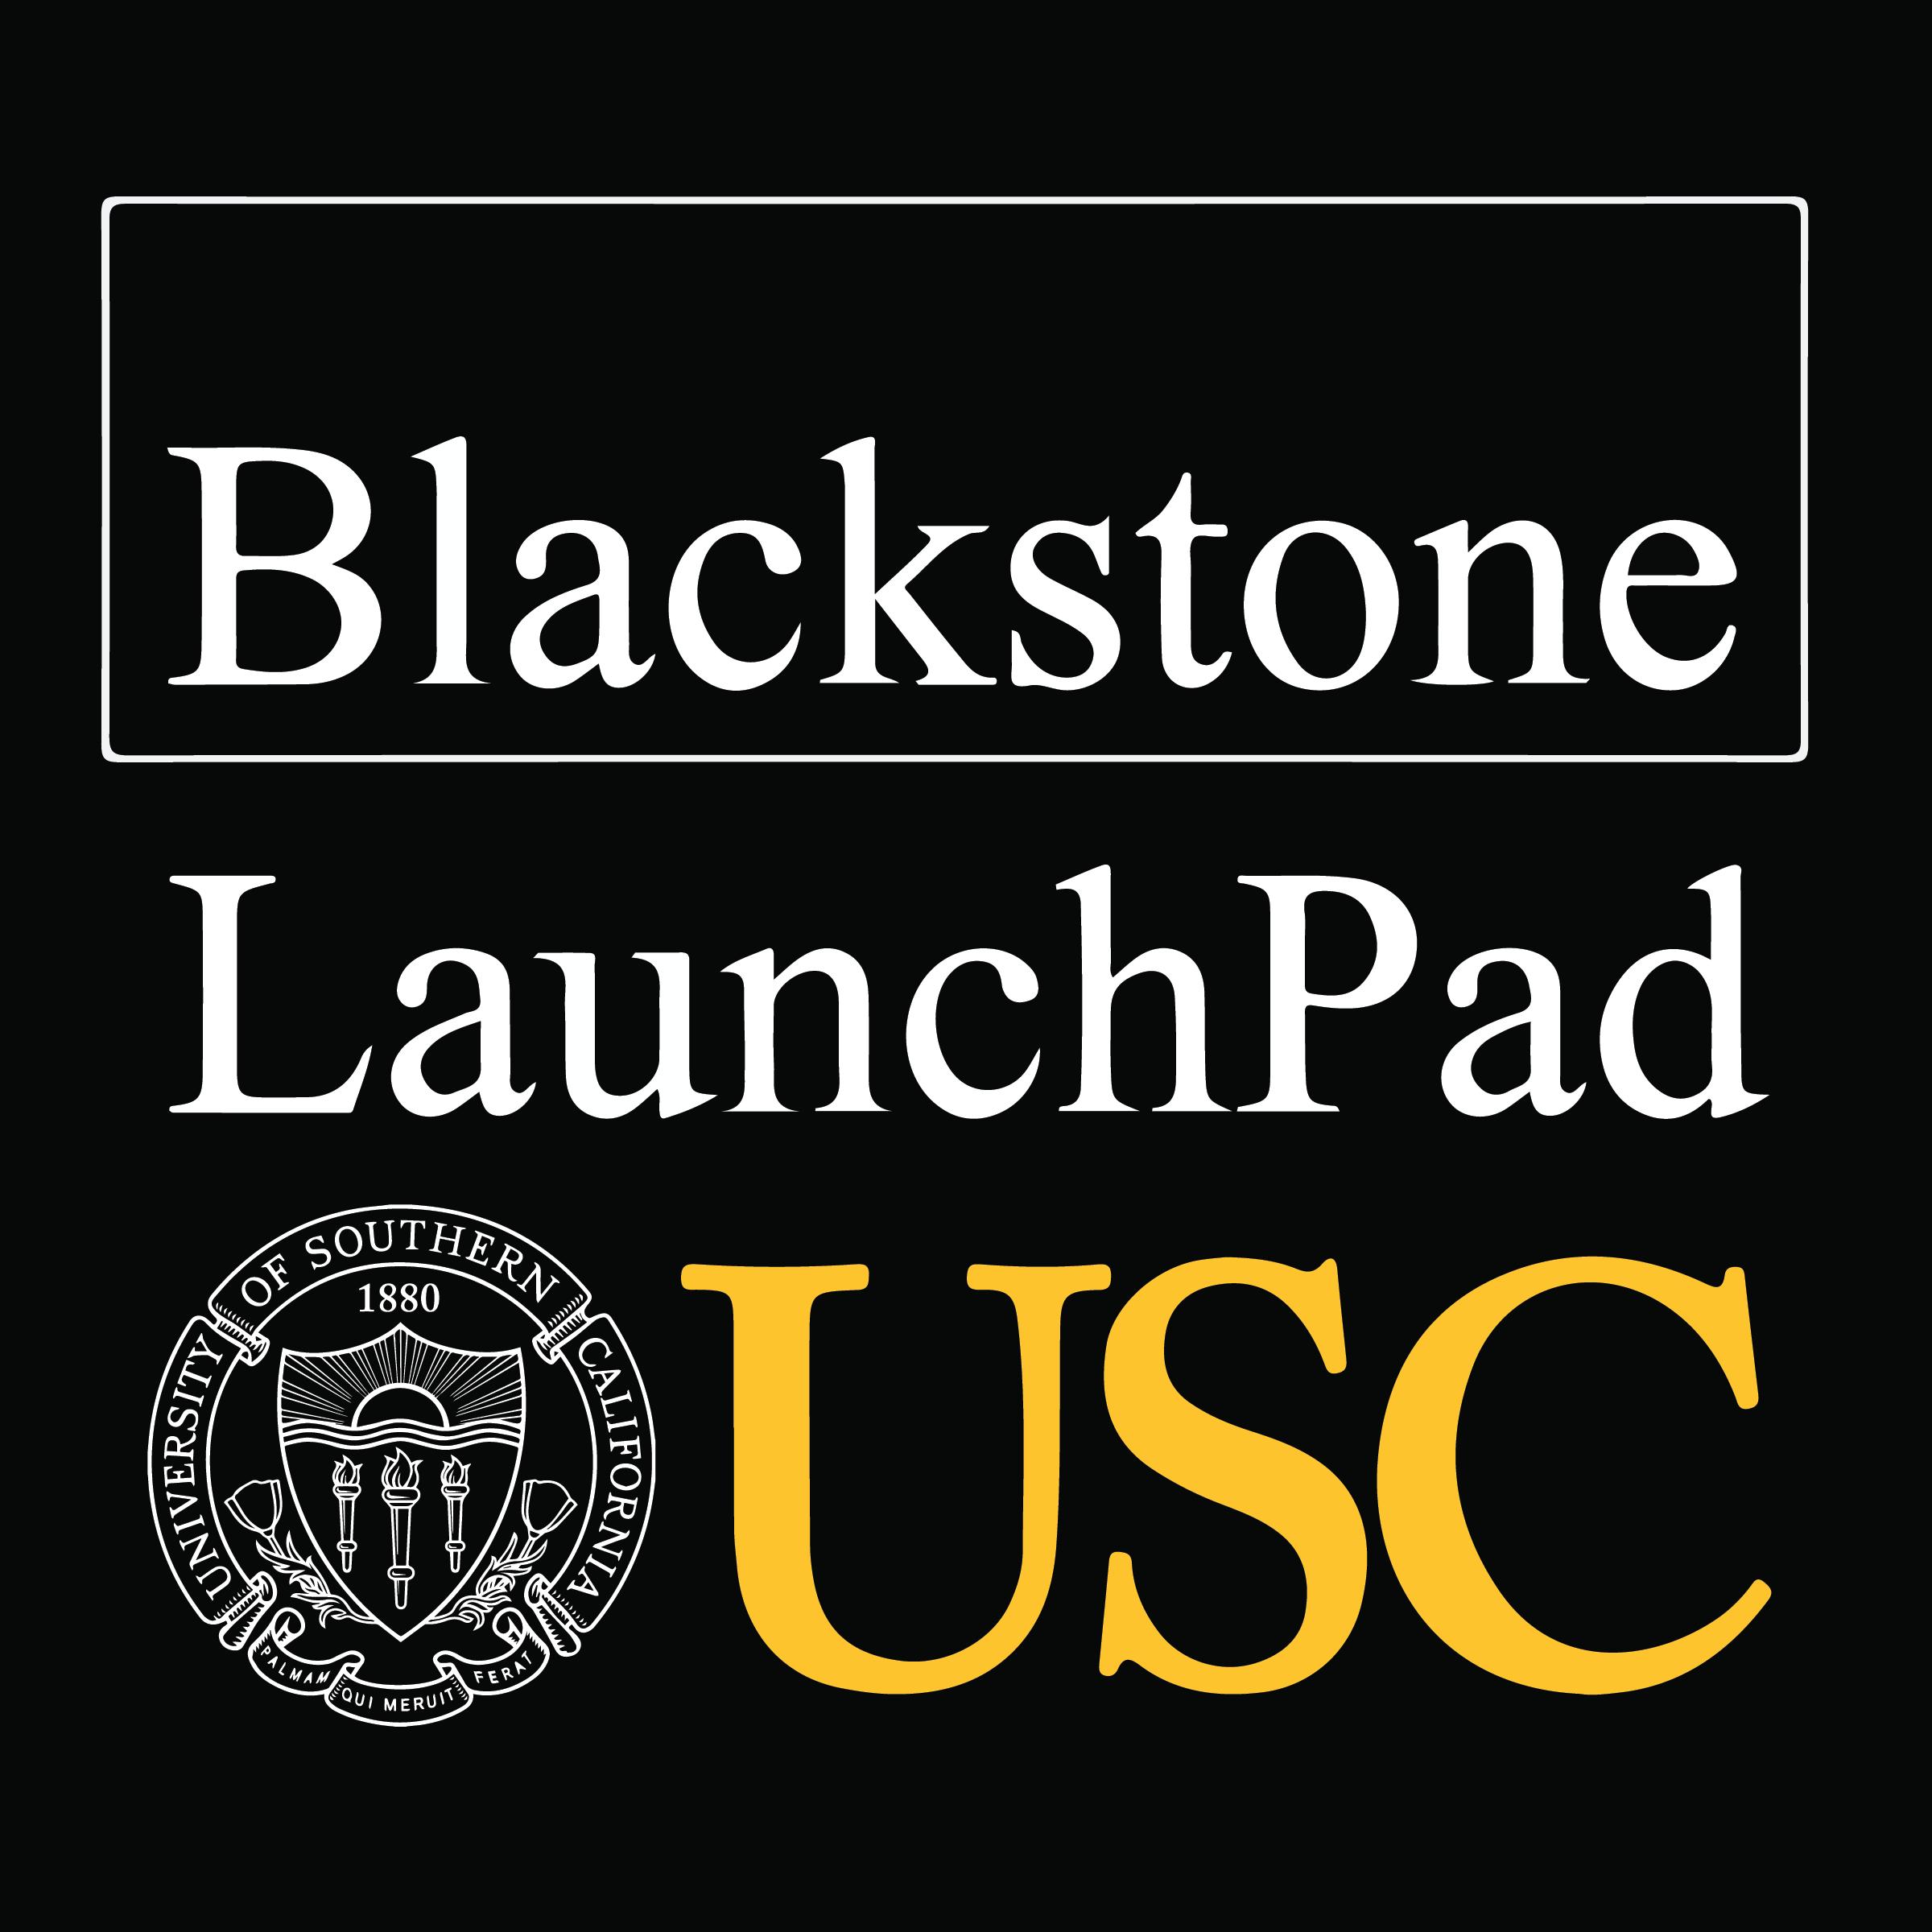 blackstone_launchpad_logo-01